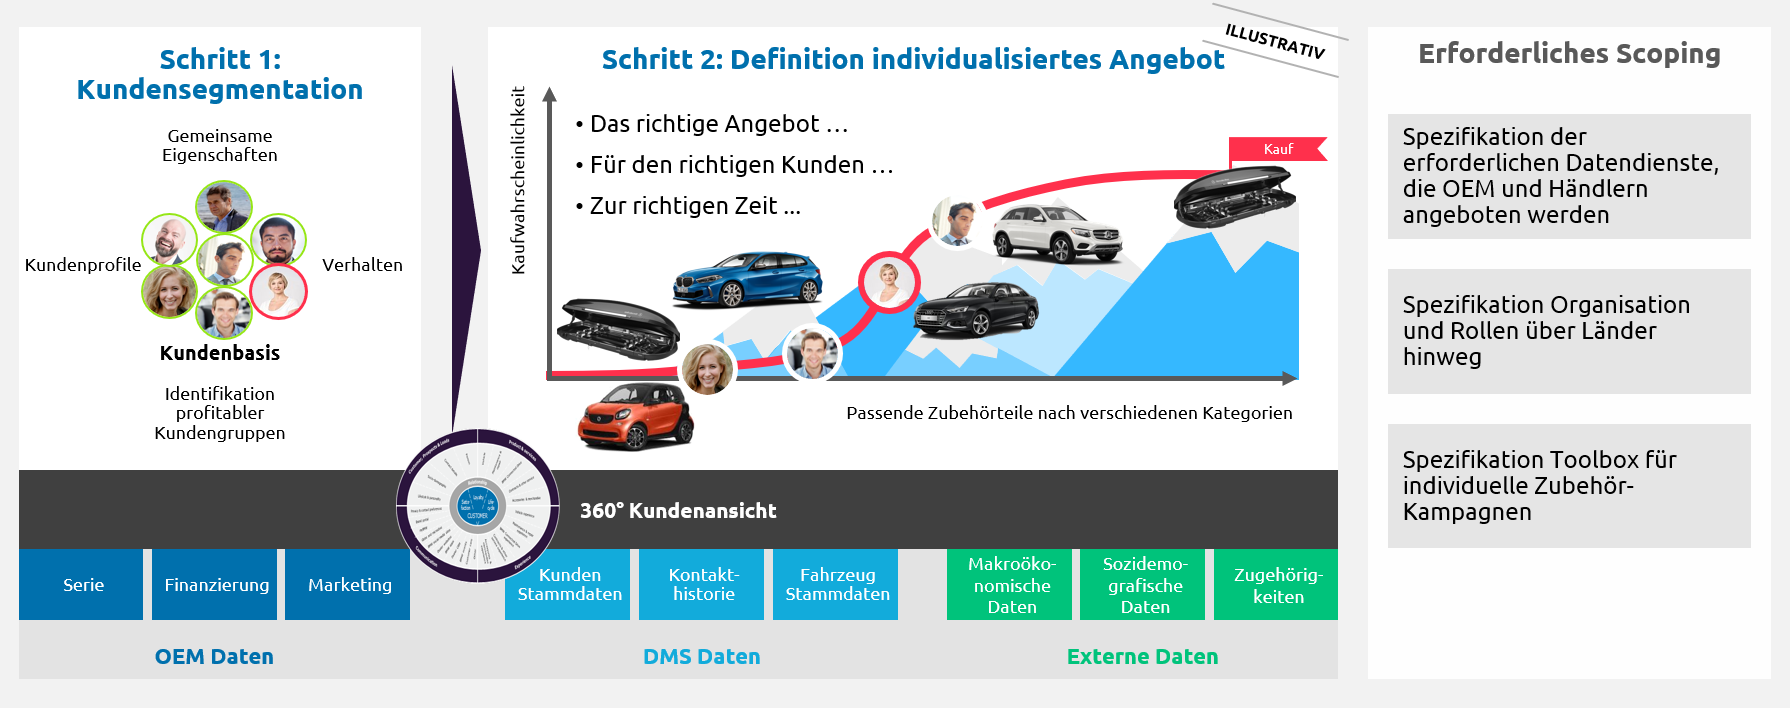 Abbildung 2 Capgemini Invetn Personalisierung Aftersales